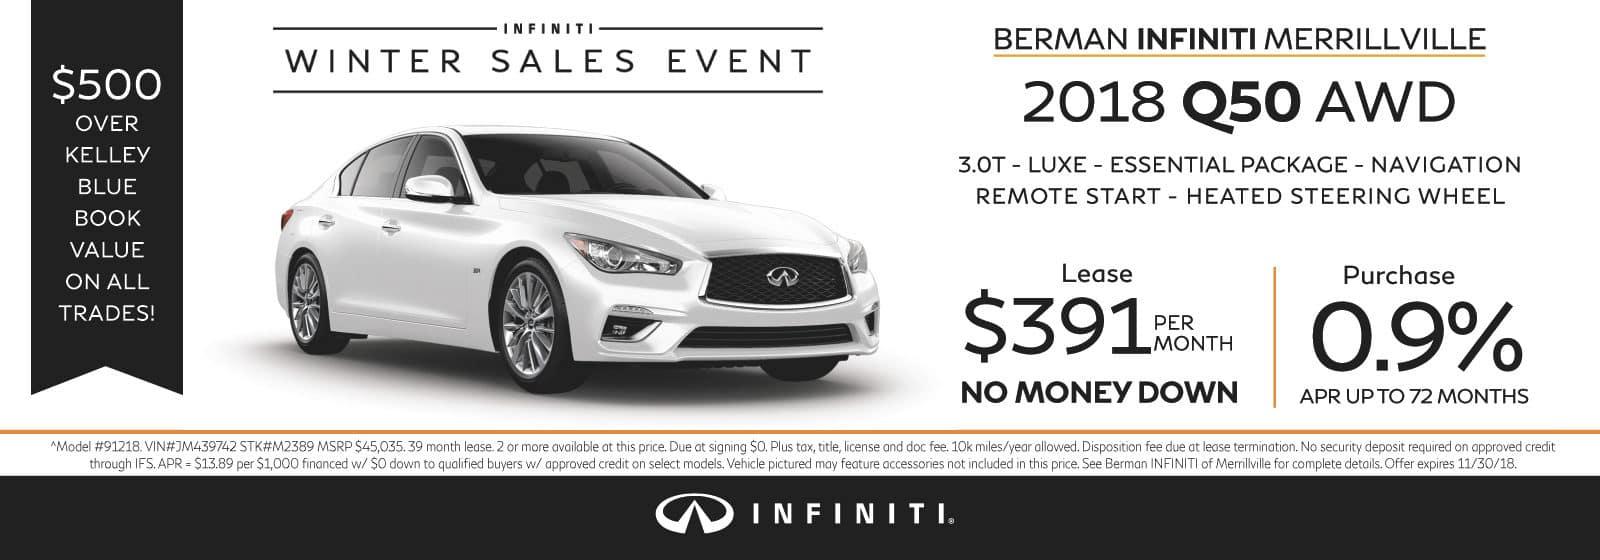 New 2018 INFINITI Q50 November Offer at Berman INFINITI of Merrillville!